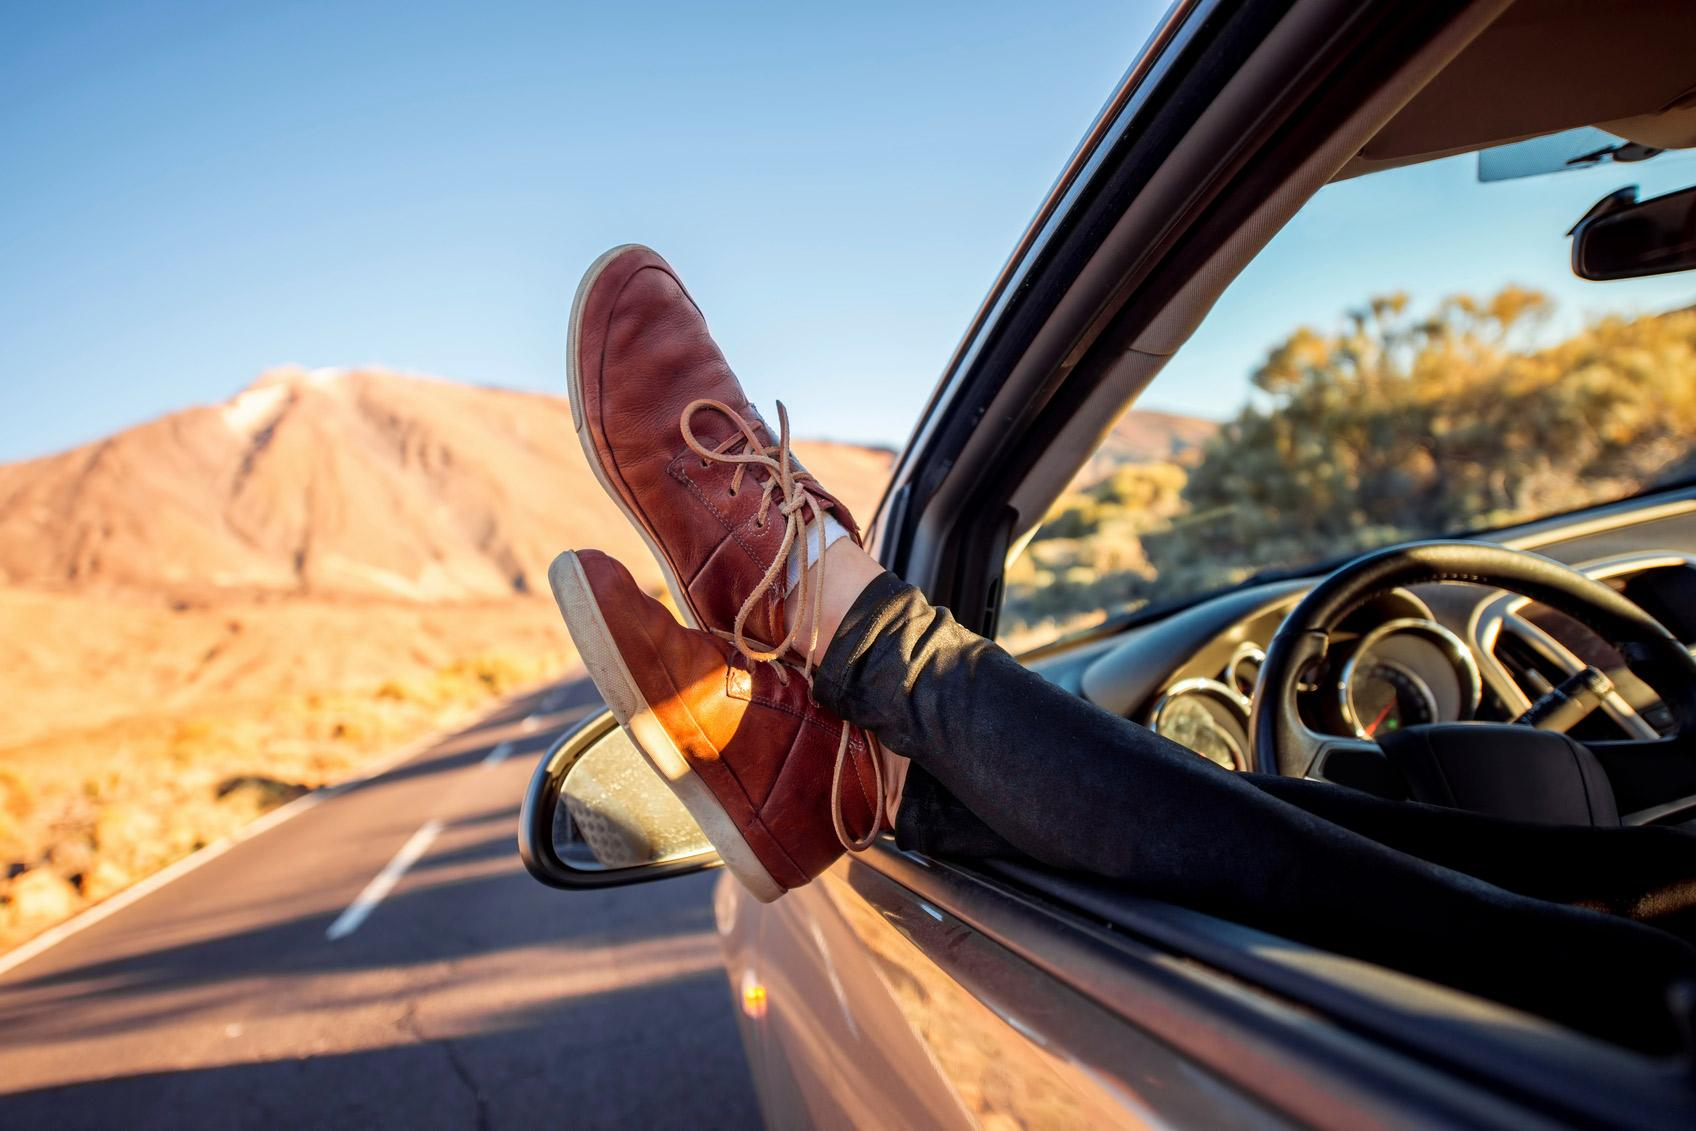 Musk lat inte bilen kora sjalv